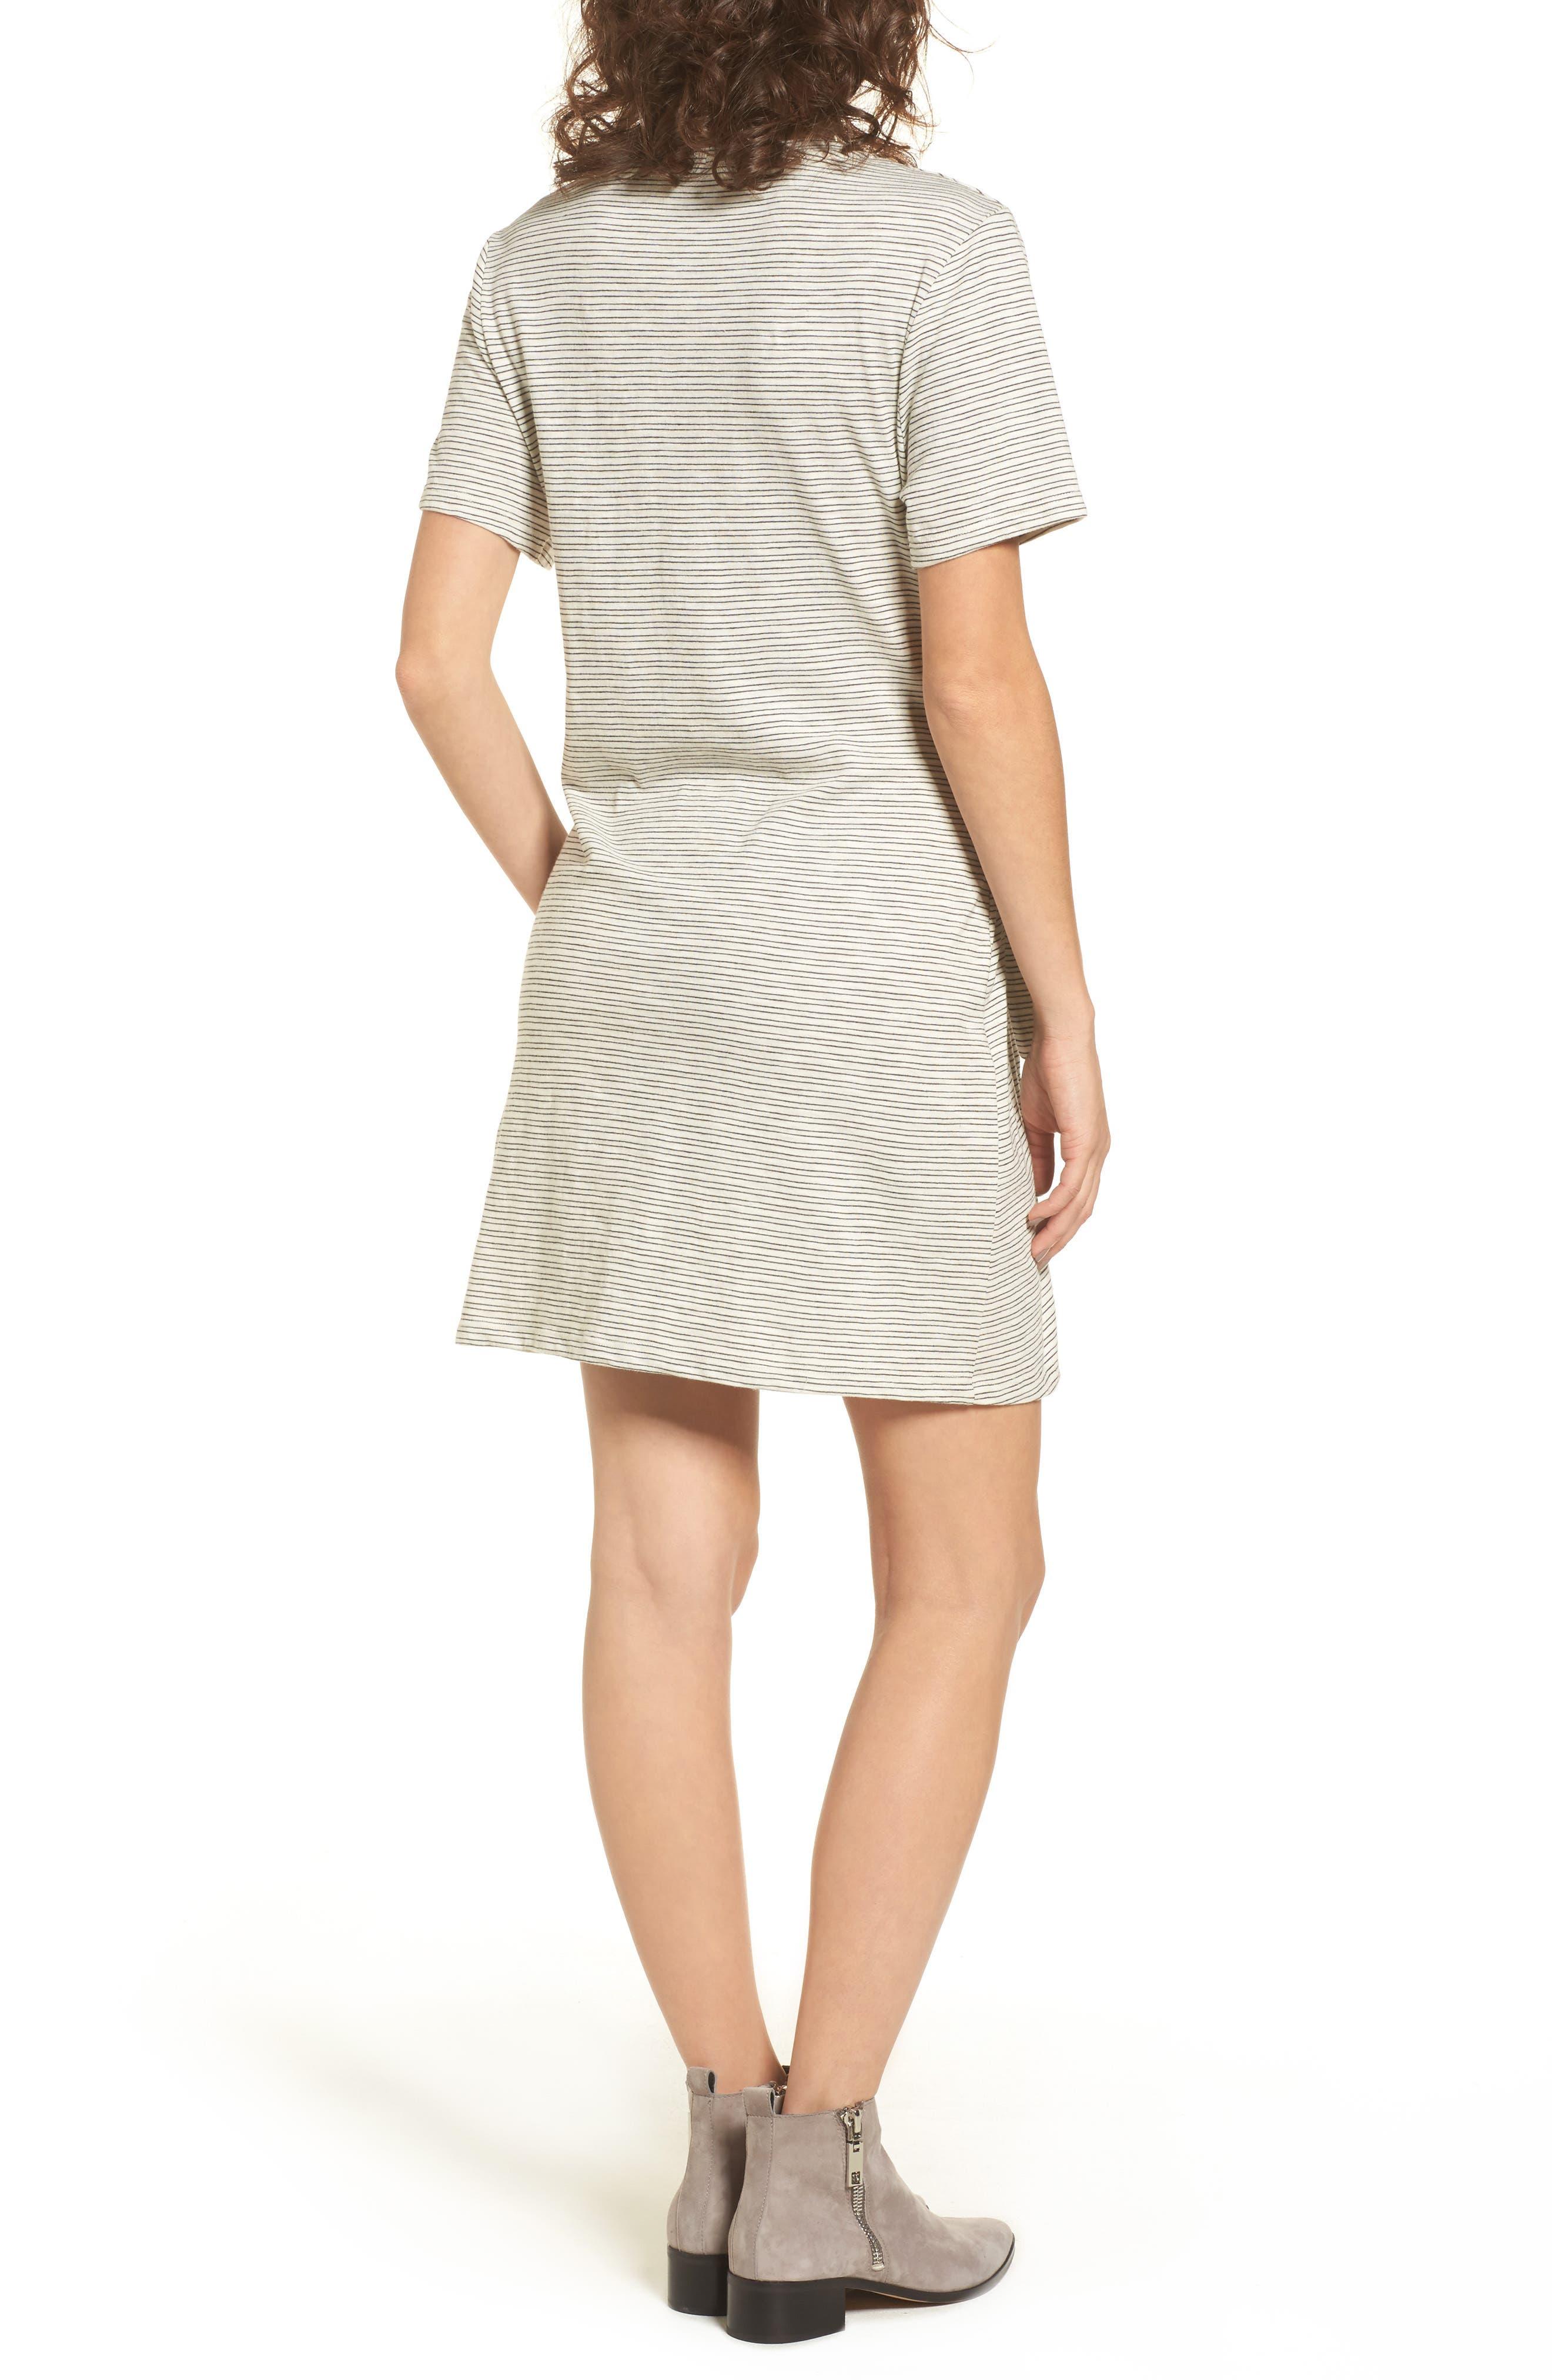 Alternate Image 2  - Side Knot Tee Dress